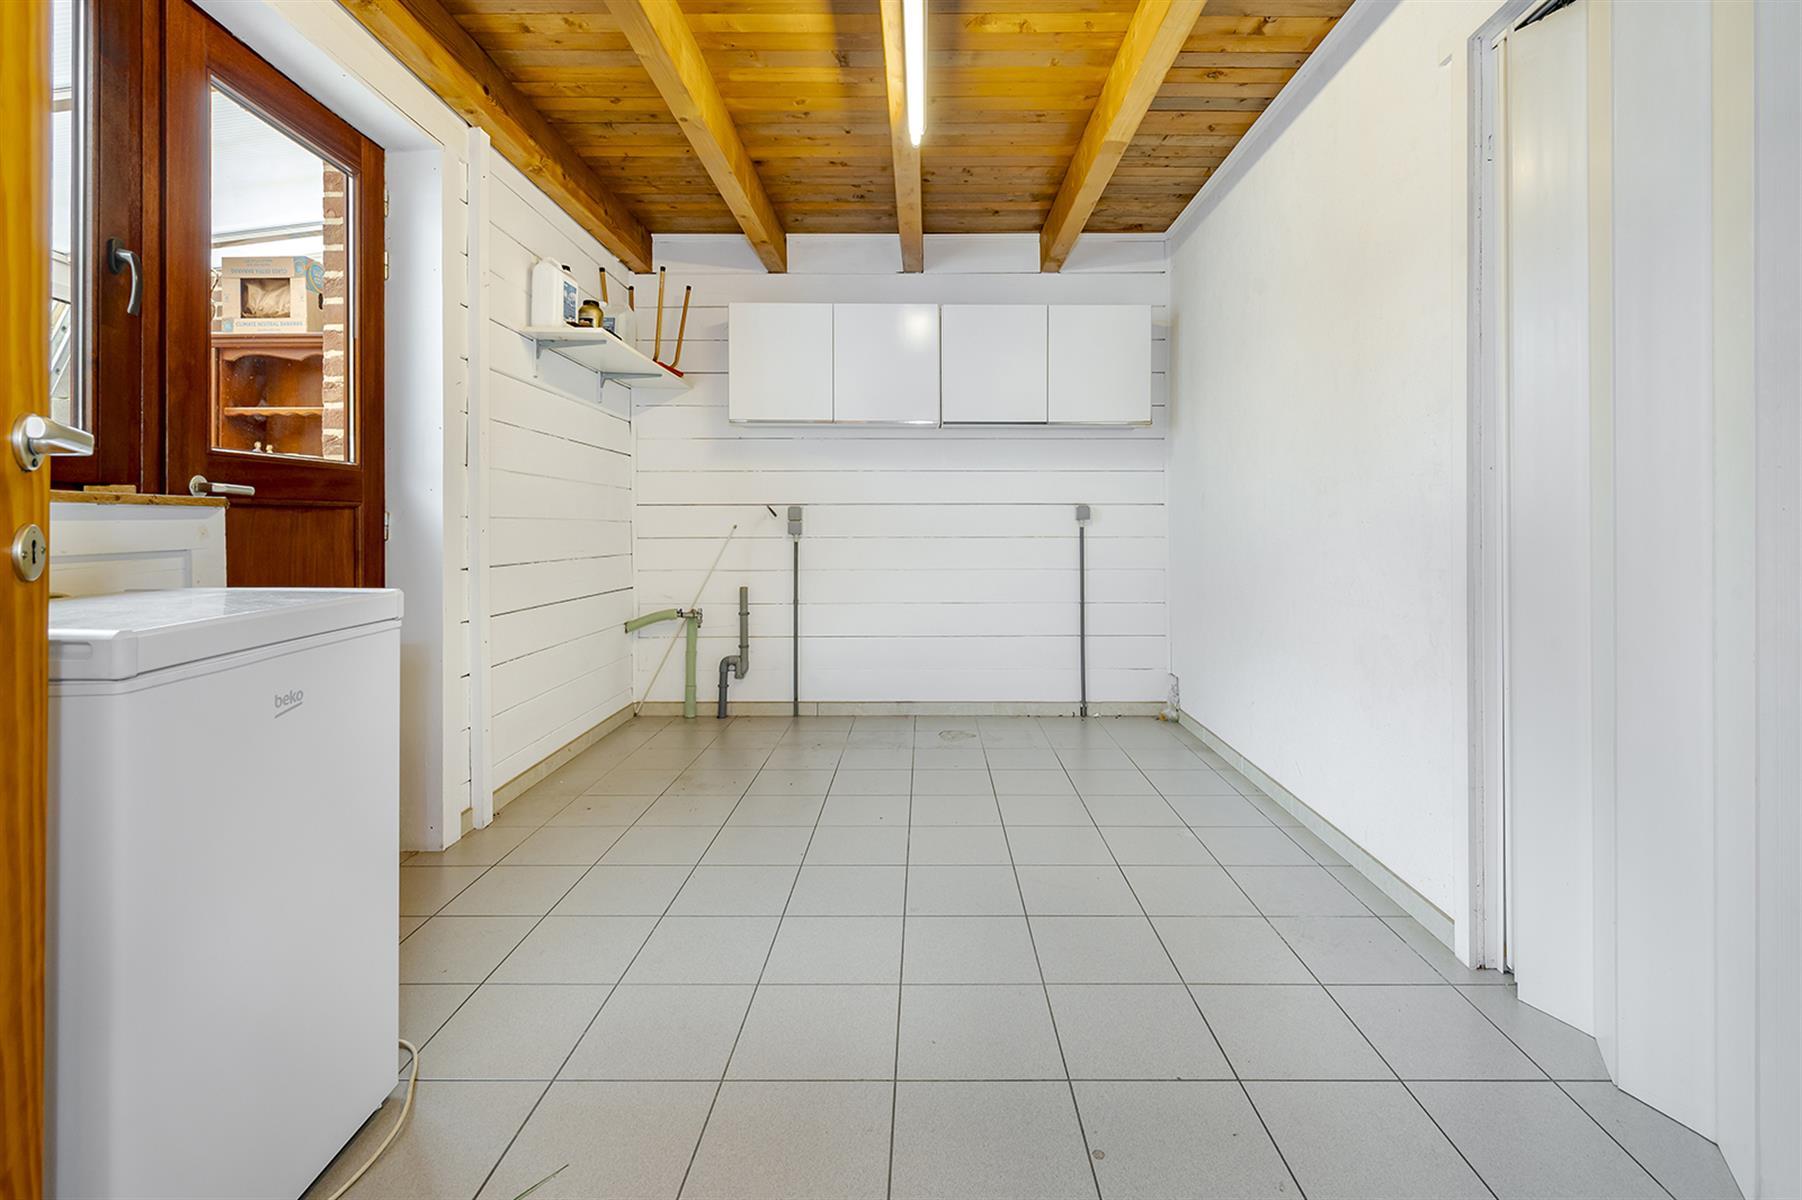 Maison - Berloz - #4189505-8